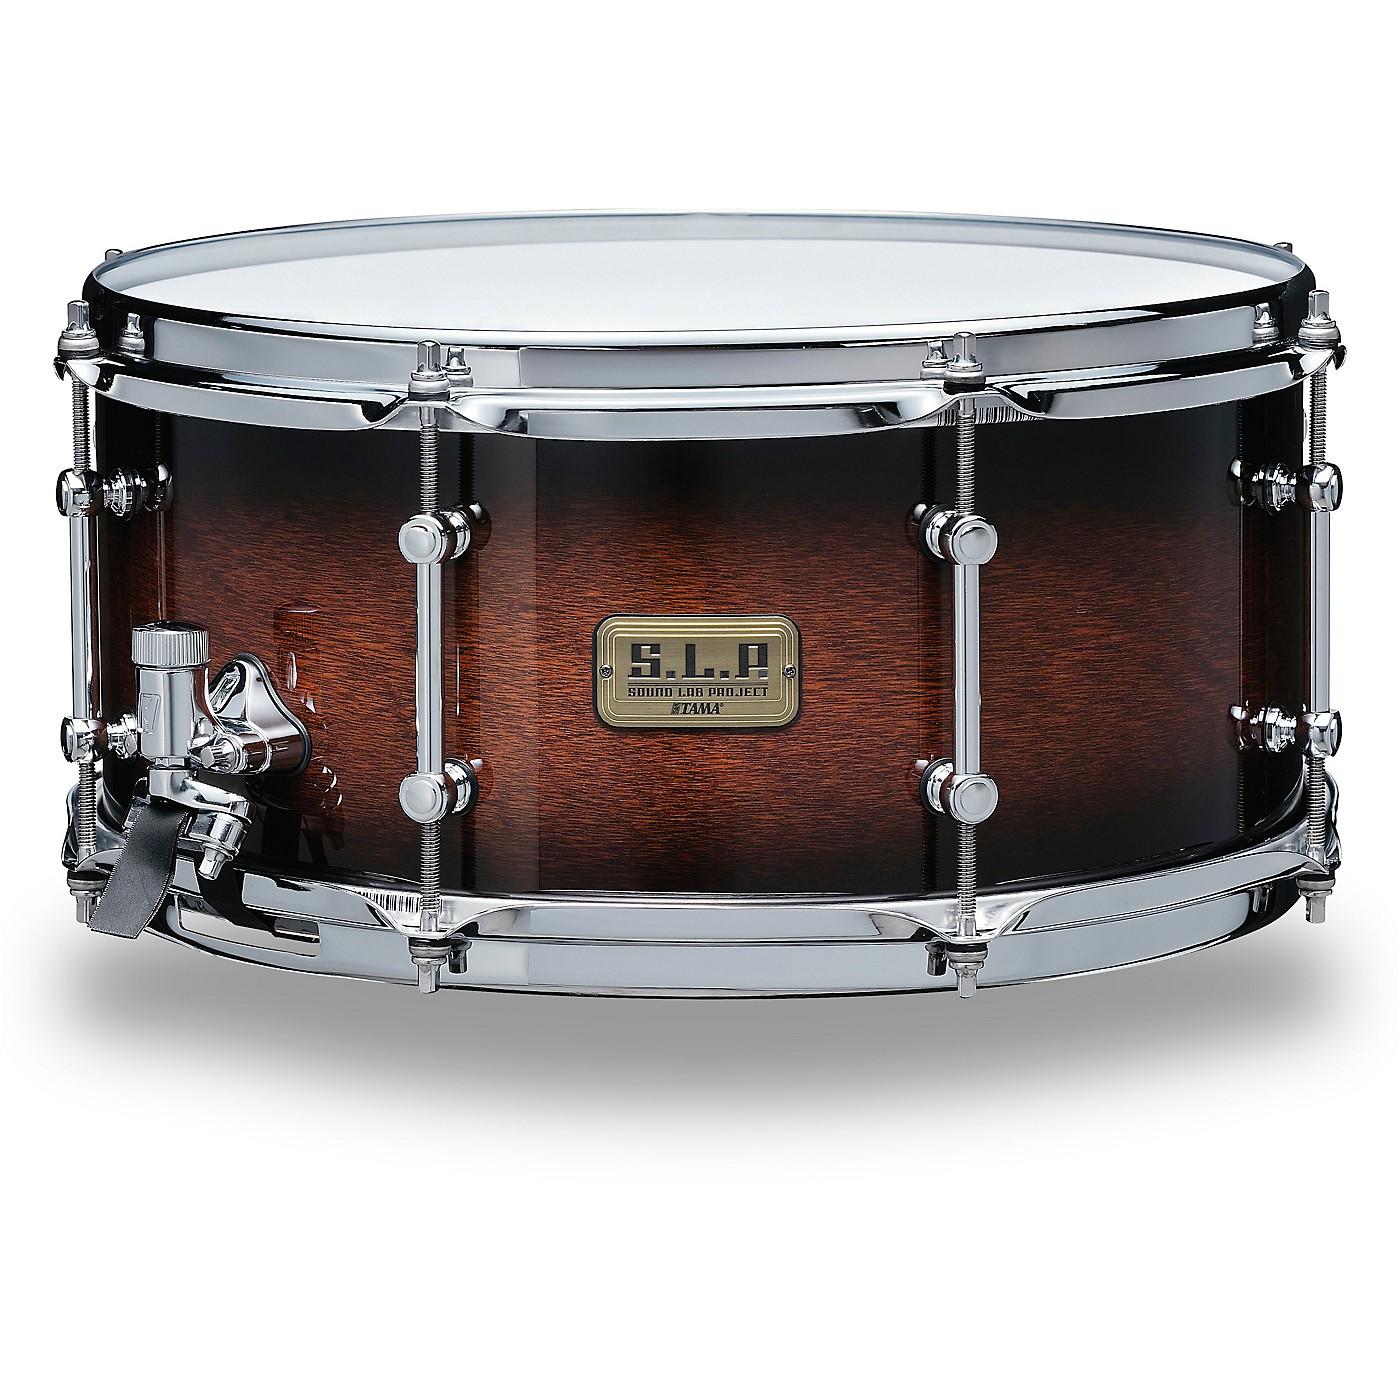 TAMA S.L.P. Dynamic Kapur Snare Drum thumbnail